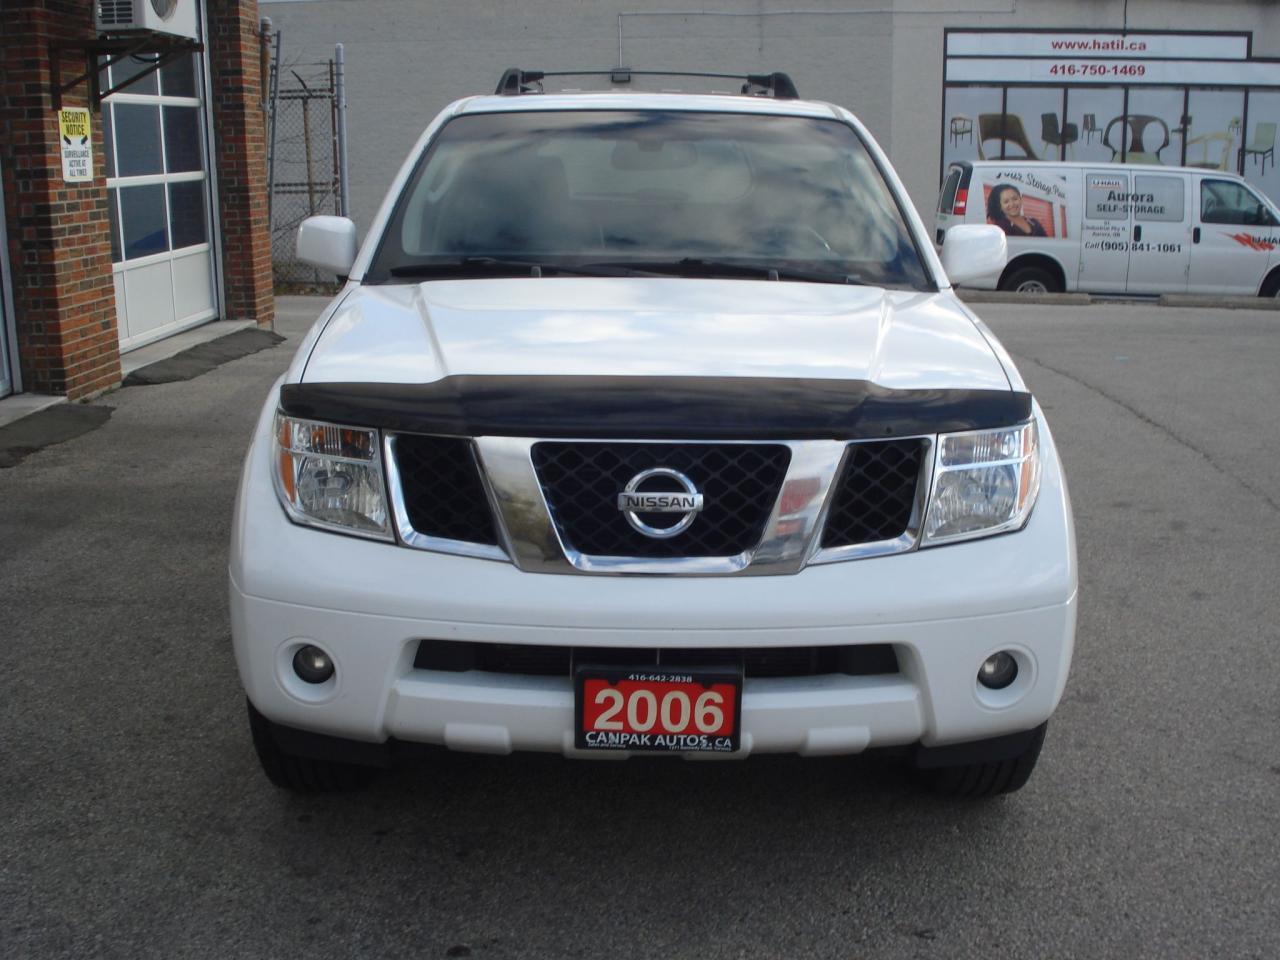 Photo of White 2006 Nissan Pathfinder